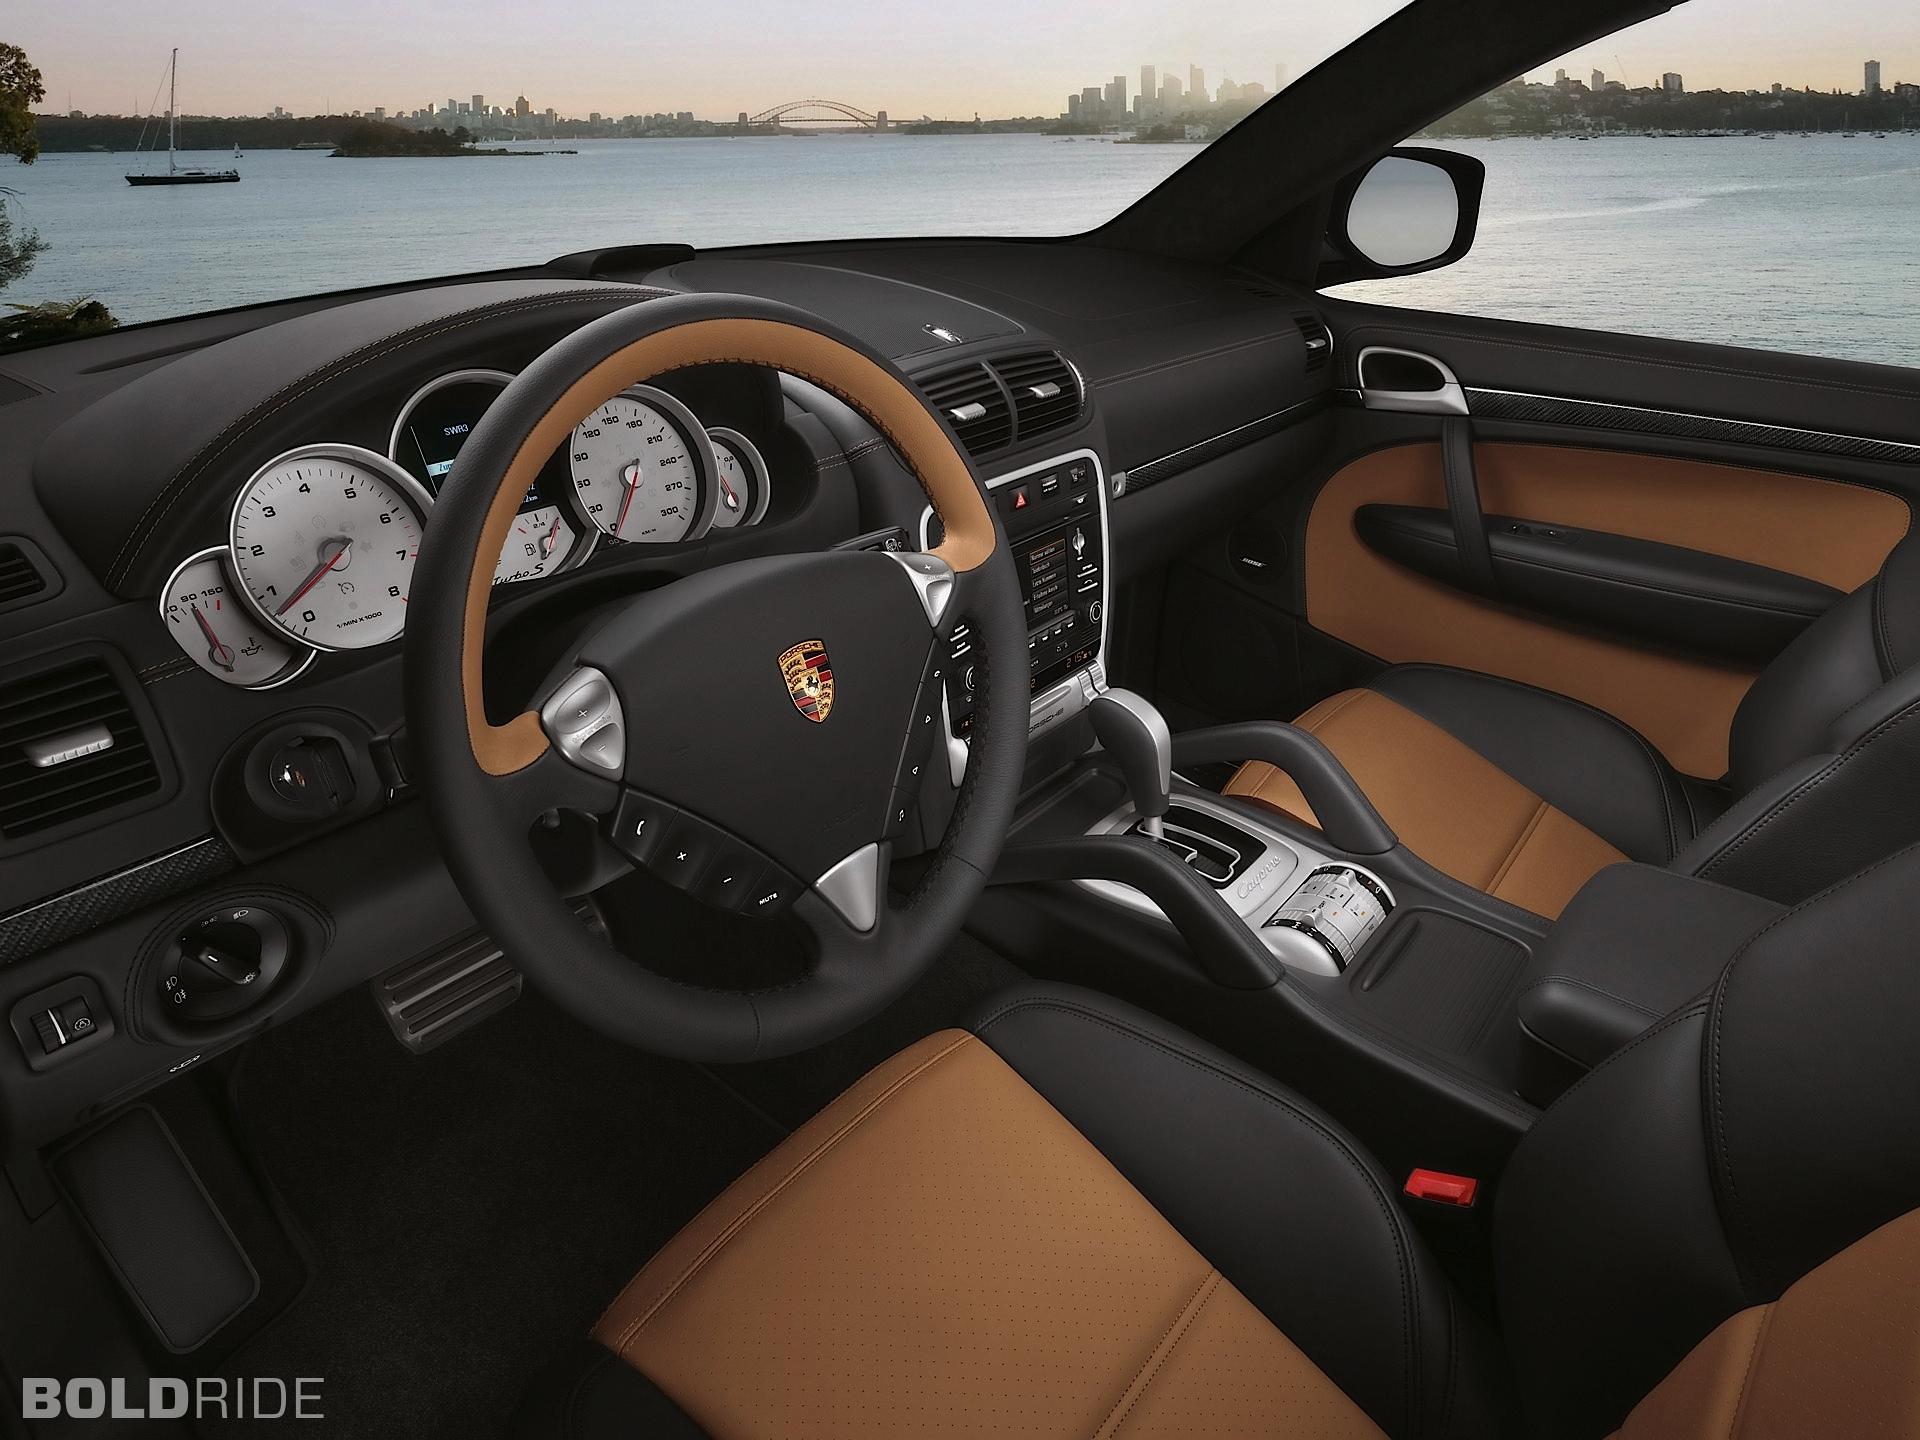 2009 Porsche Cayenne Turbo S Boldride com   Pictures   HD Wallpaper